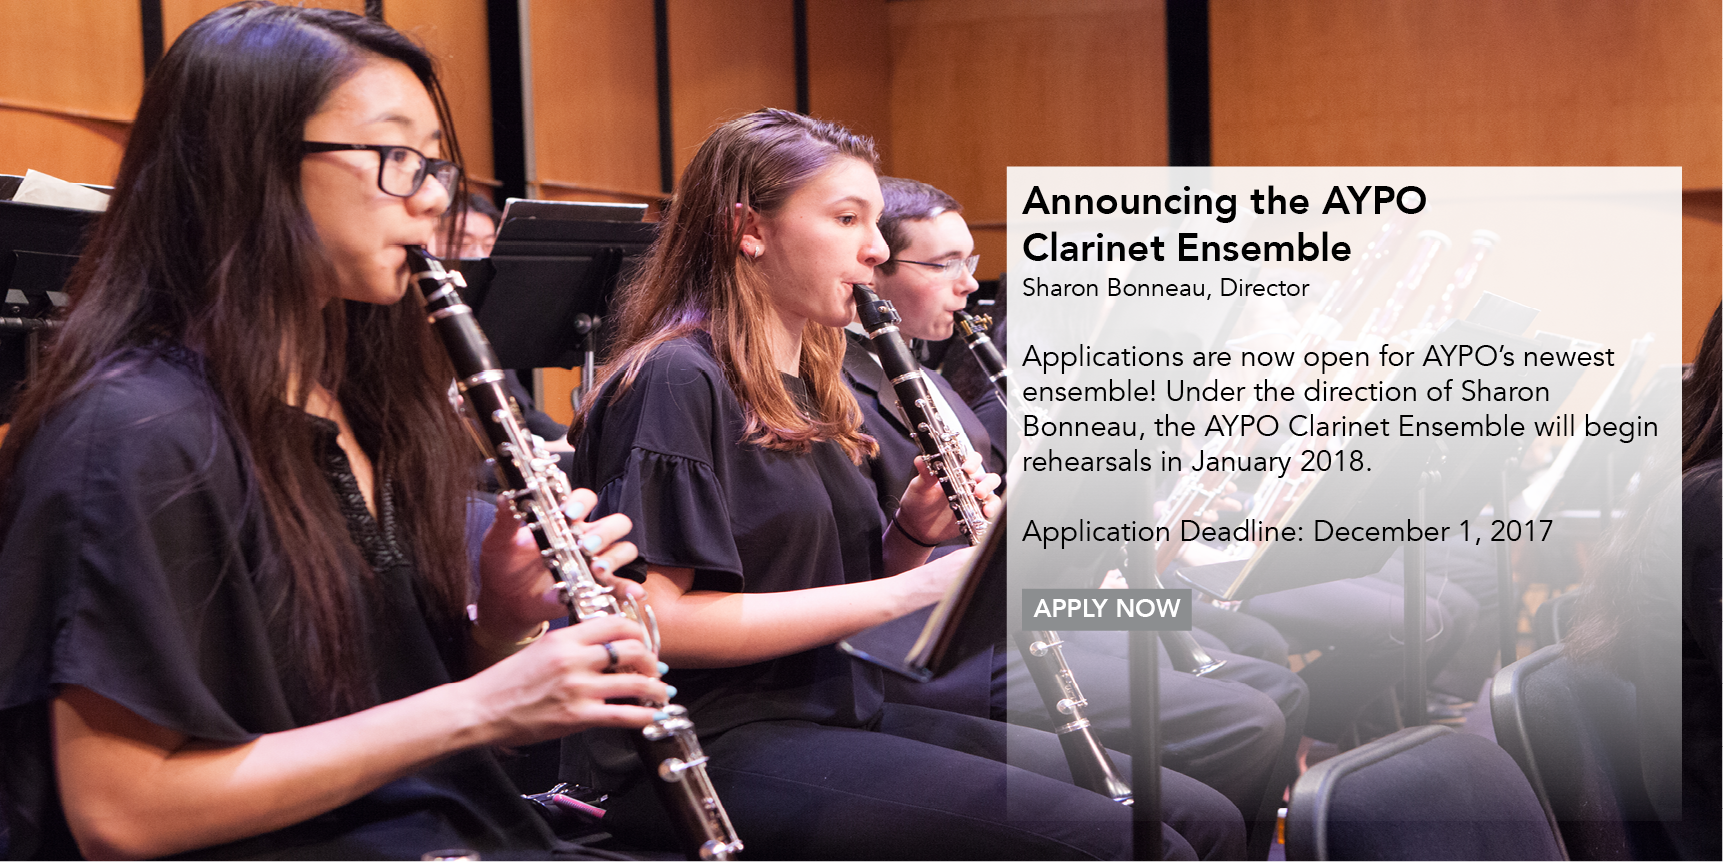 Clarinet Ensemble.png